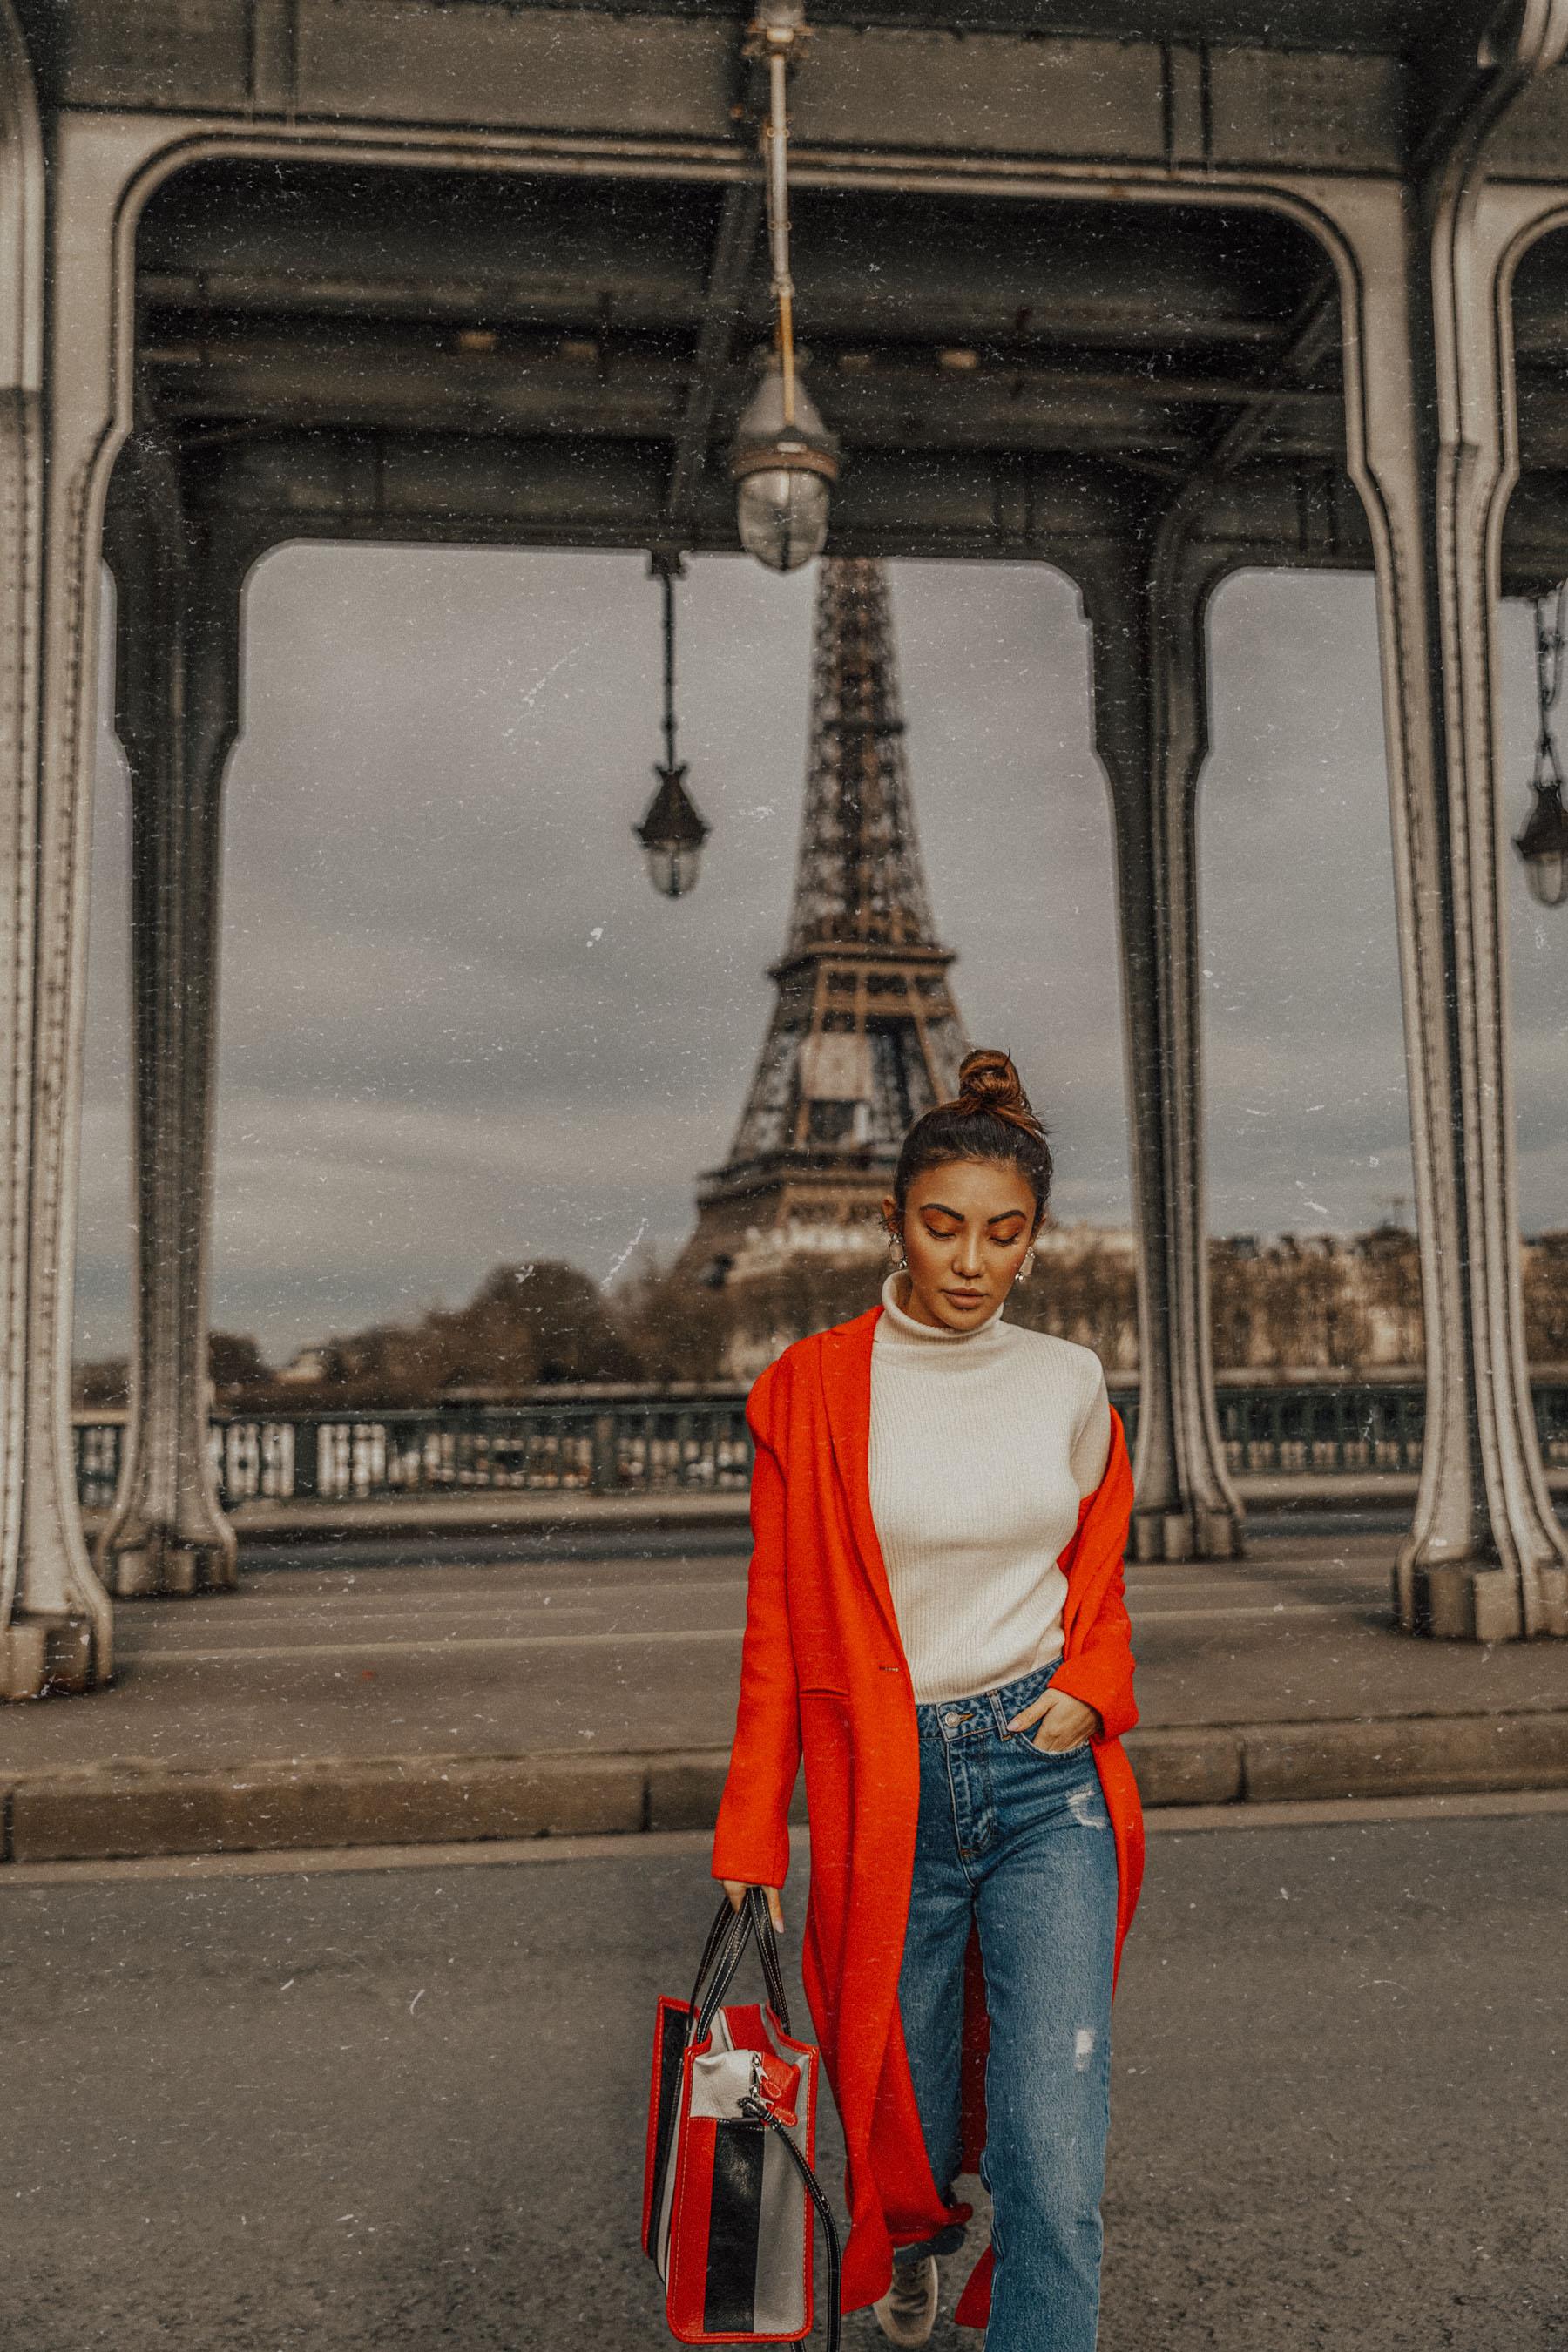 Winter Trends You Can Still Wear In Spring - Bright red coat, cuffed jeans, balenciaga bazar shopper, jessica wang in paris, pfw street style, fashion blogger in paris // Notjessfashion.com